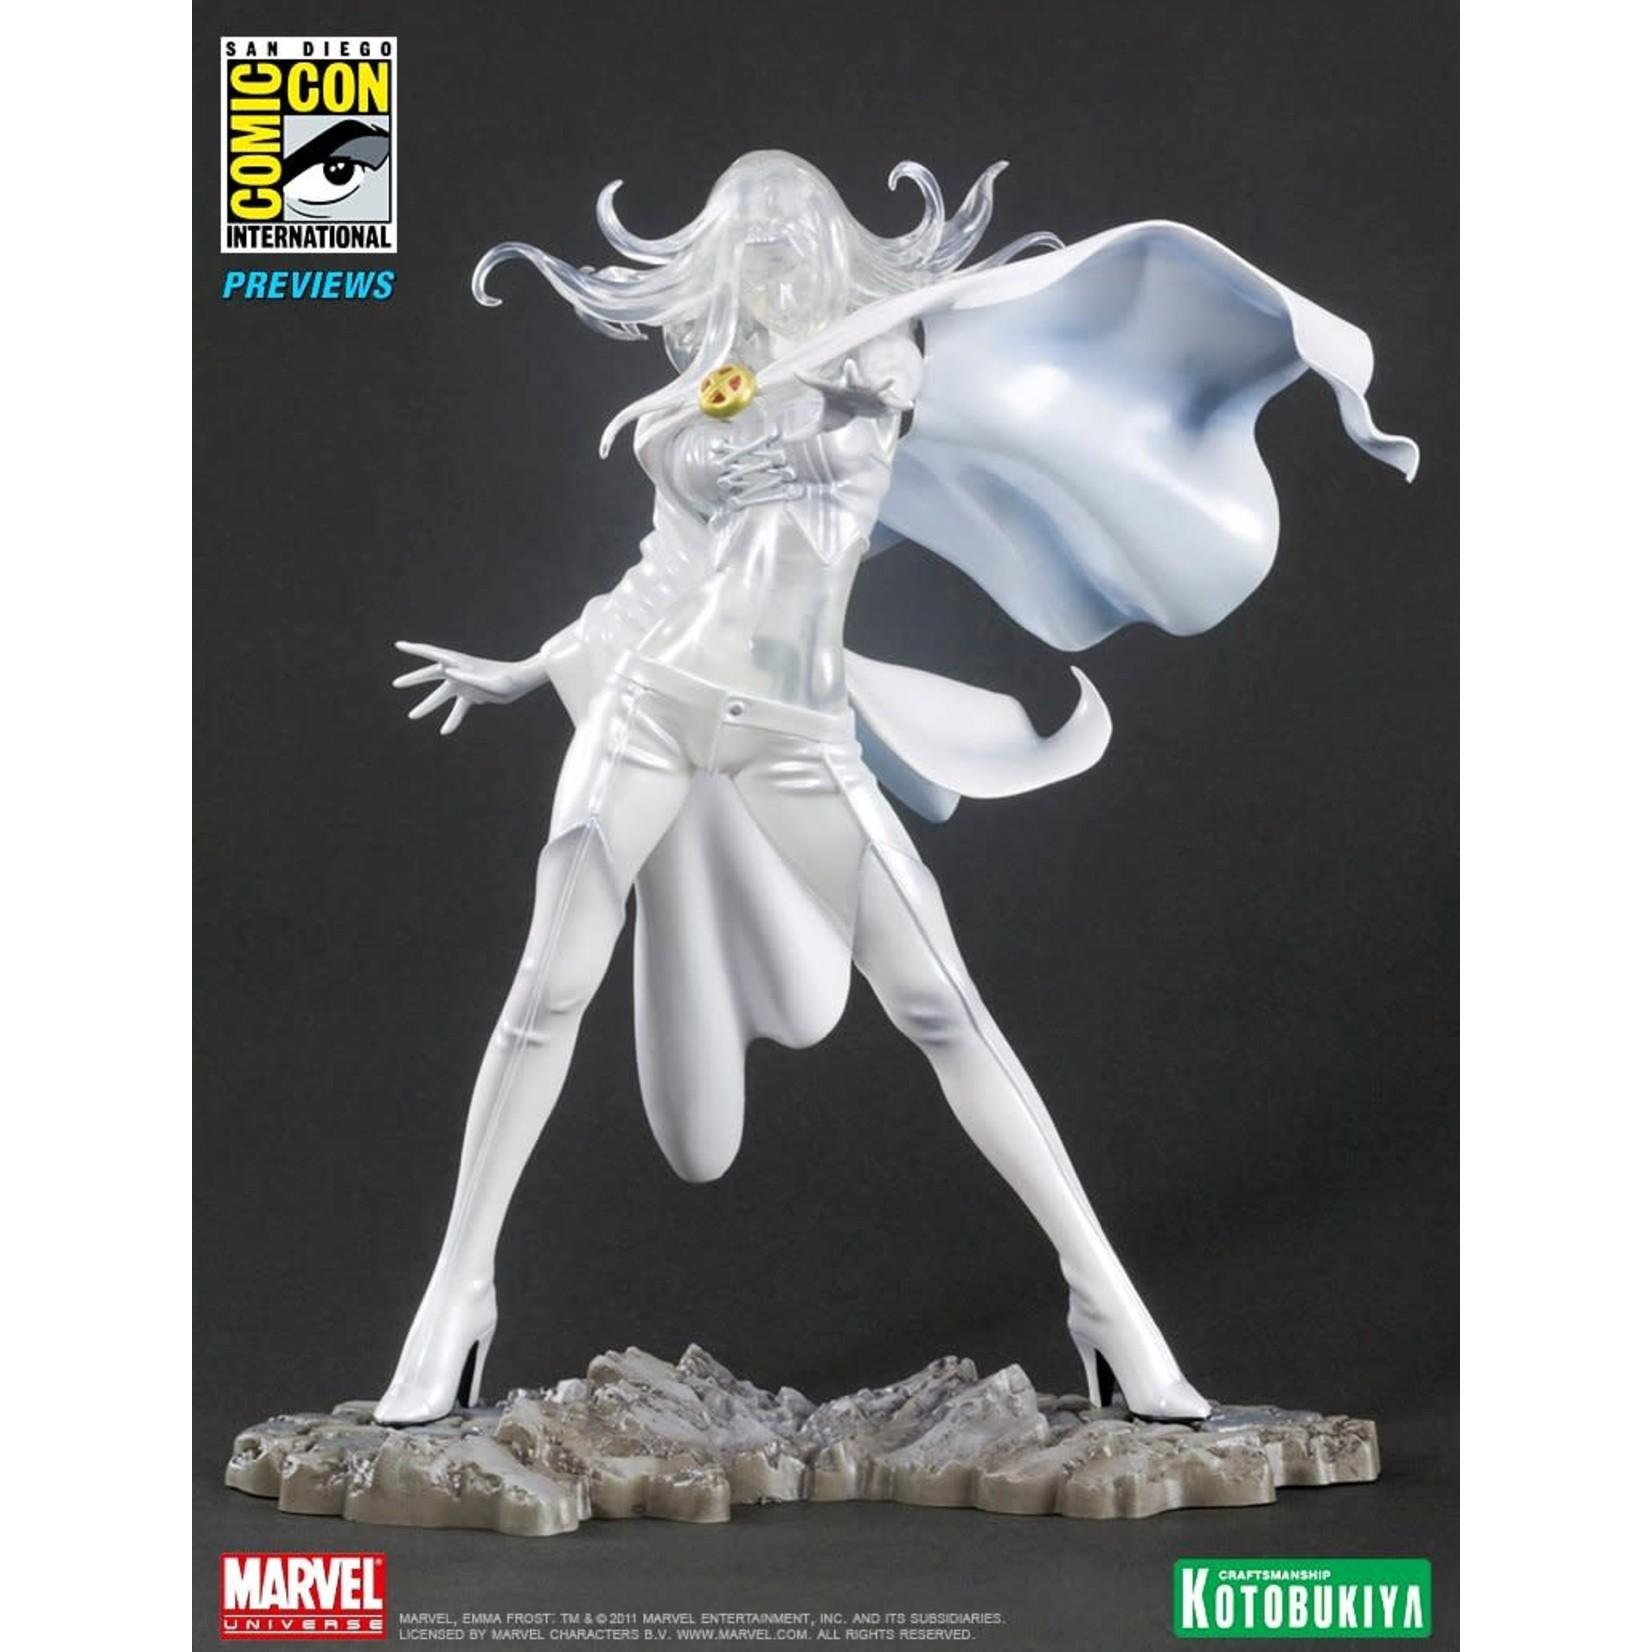 Kotobukiya X-Men - Emma Frost Diamond Ver. - Bishoujo Statue - Marvel x Bishoujo